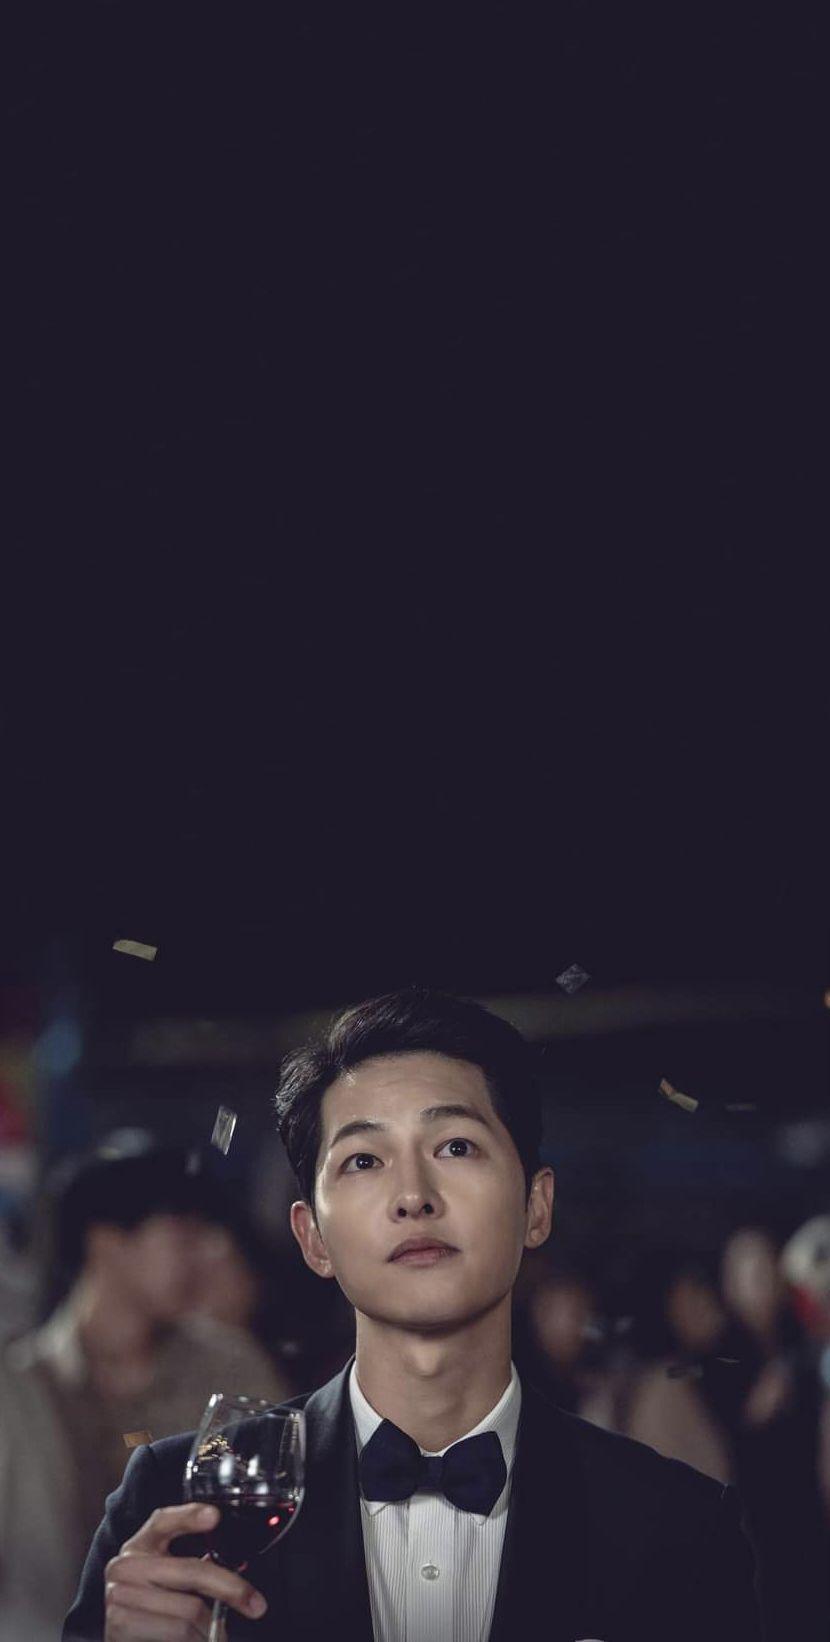 Vincenzo Wallpaper Song Joong Ki Di 2021 Aktor Korea Aktris Aktor Get ktm all bike hd wallpaper pics